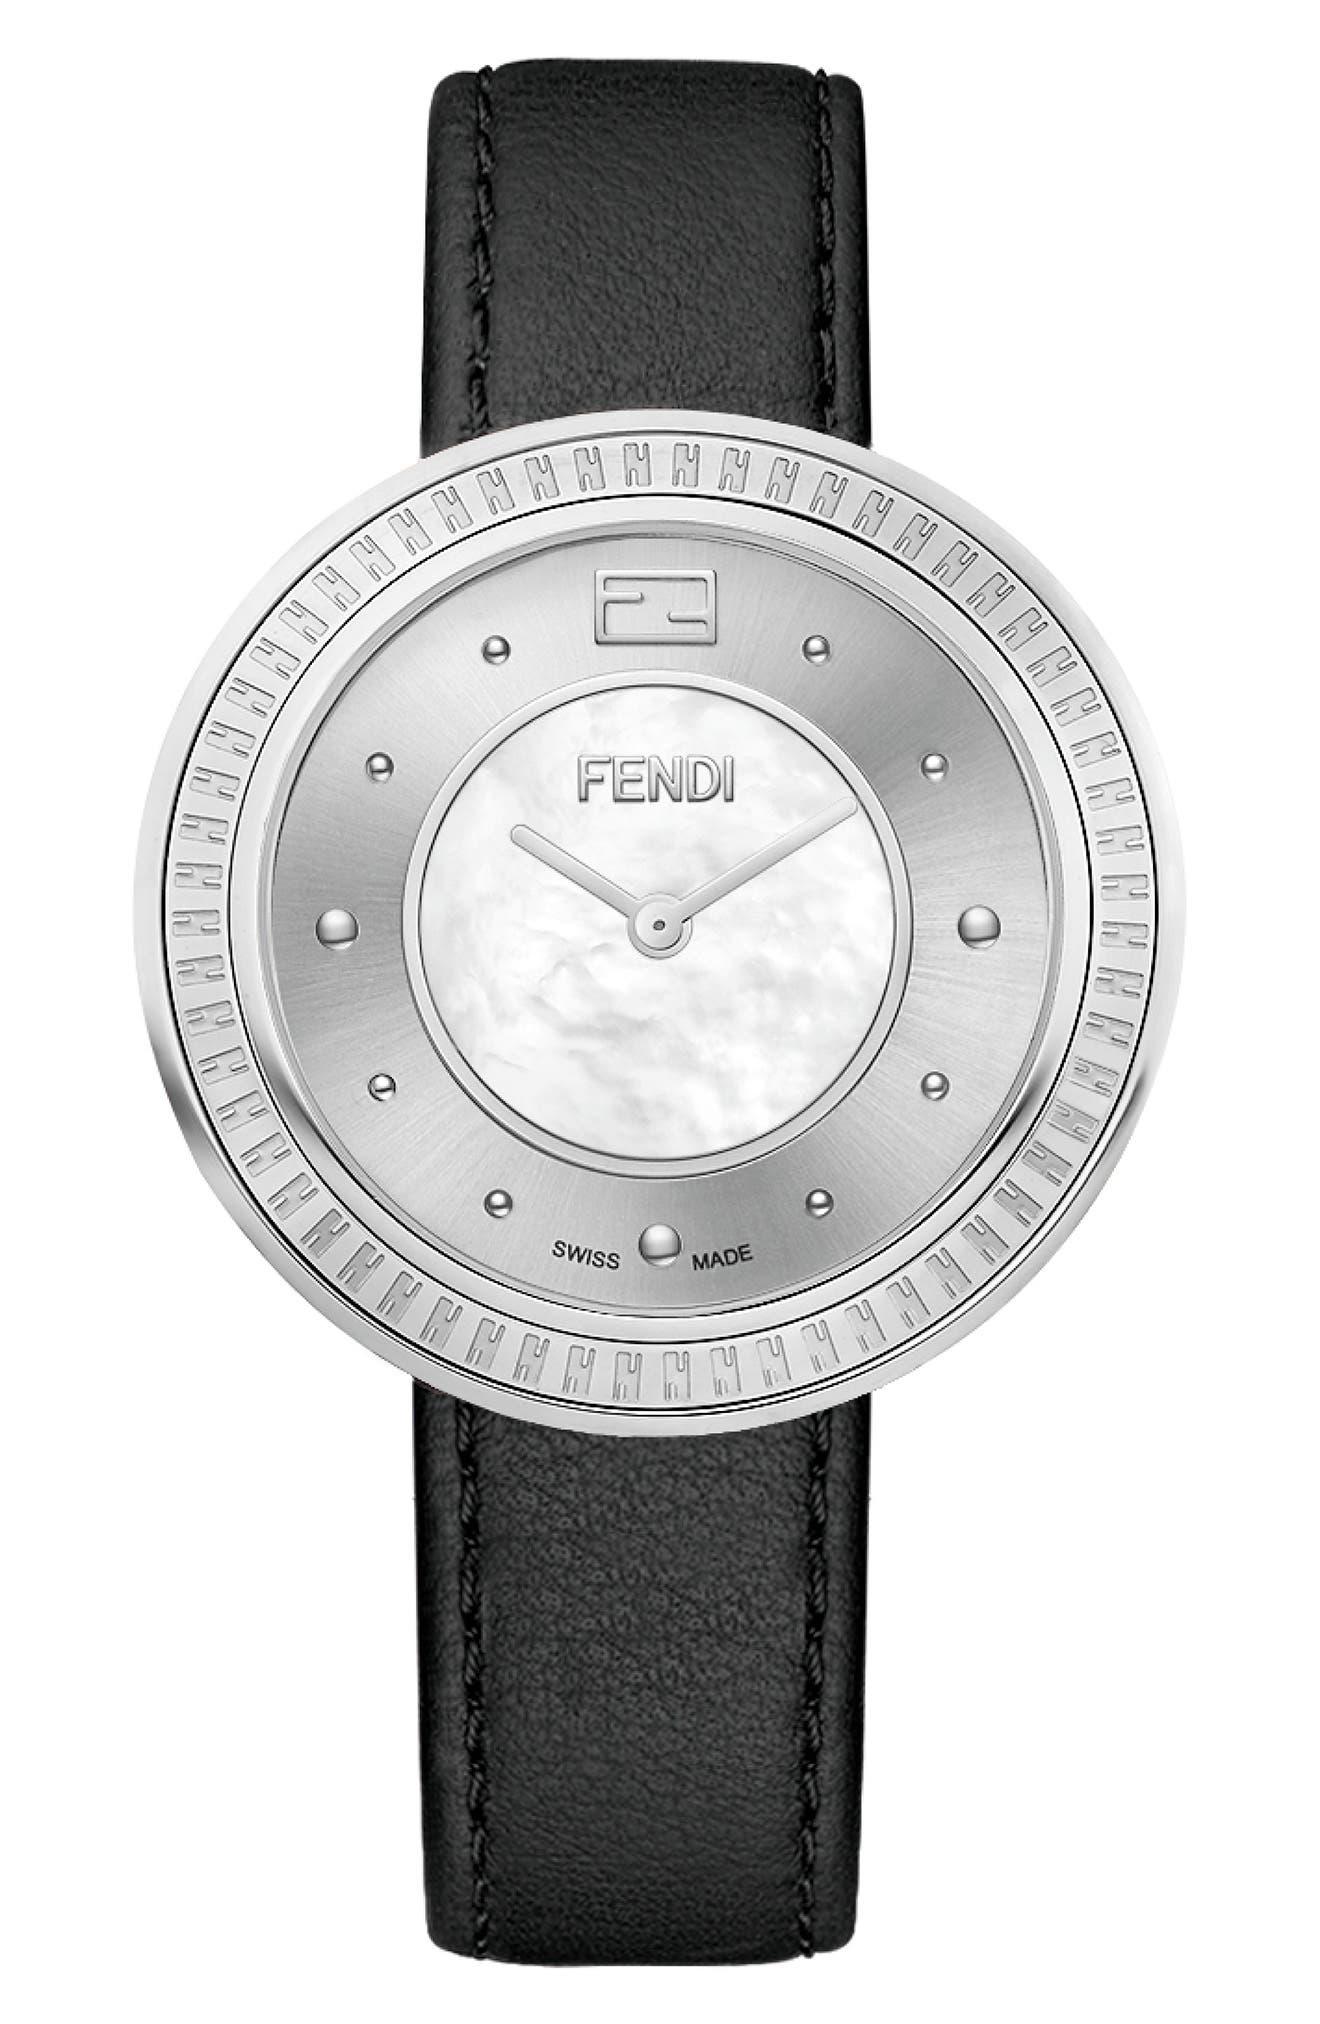 Image of FENDI Women's My Way Genuine Fox Fur Leather Strap Watch, 36mm